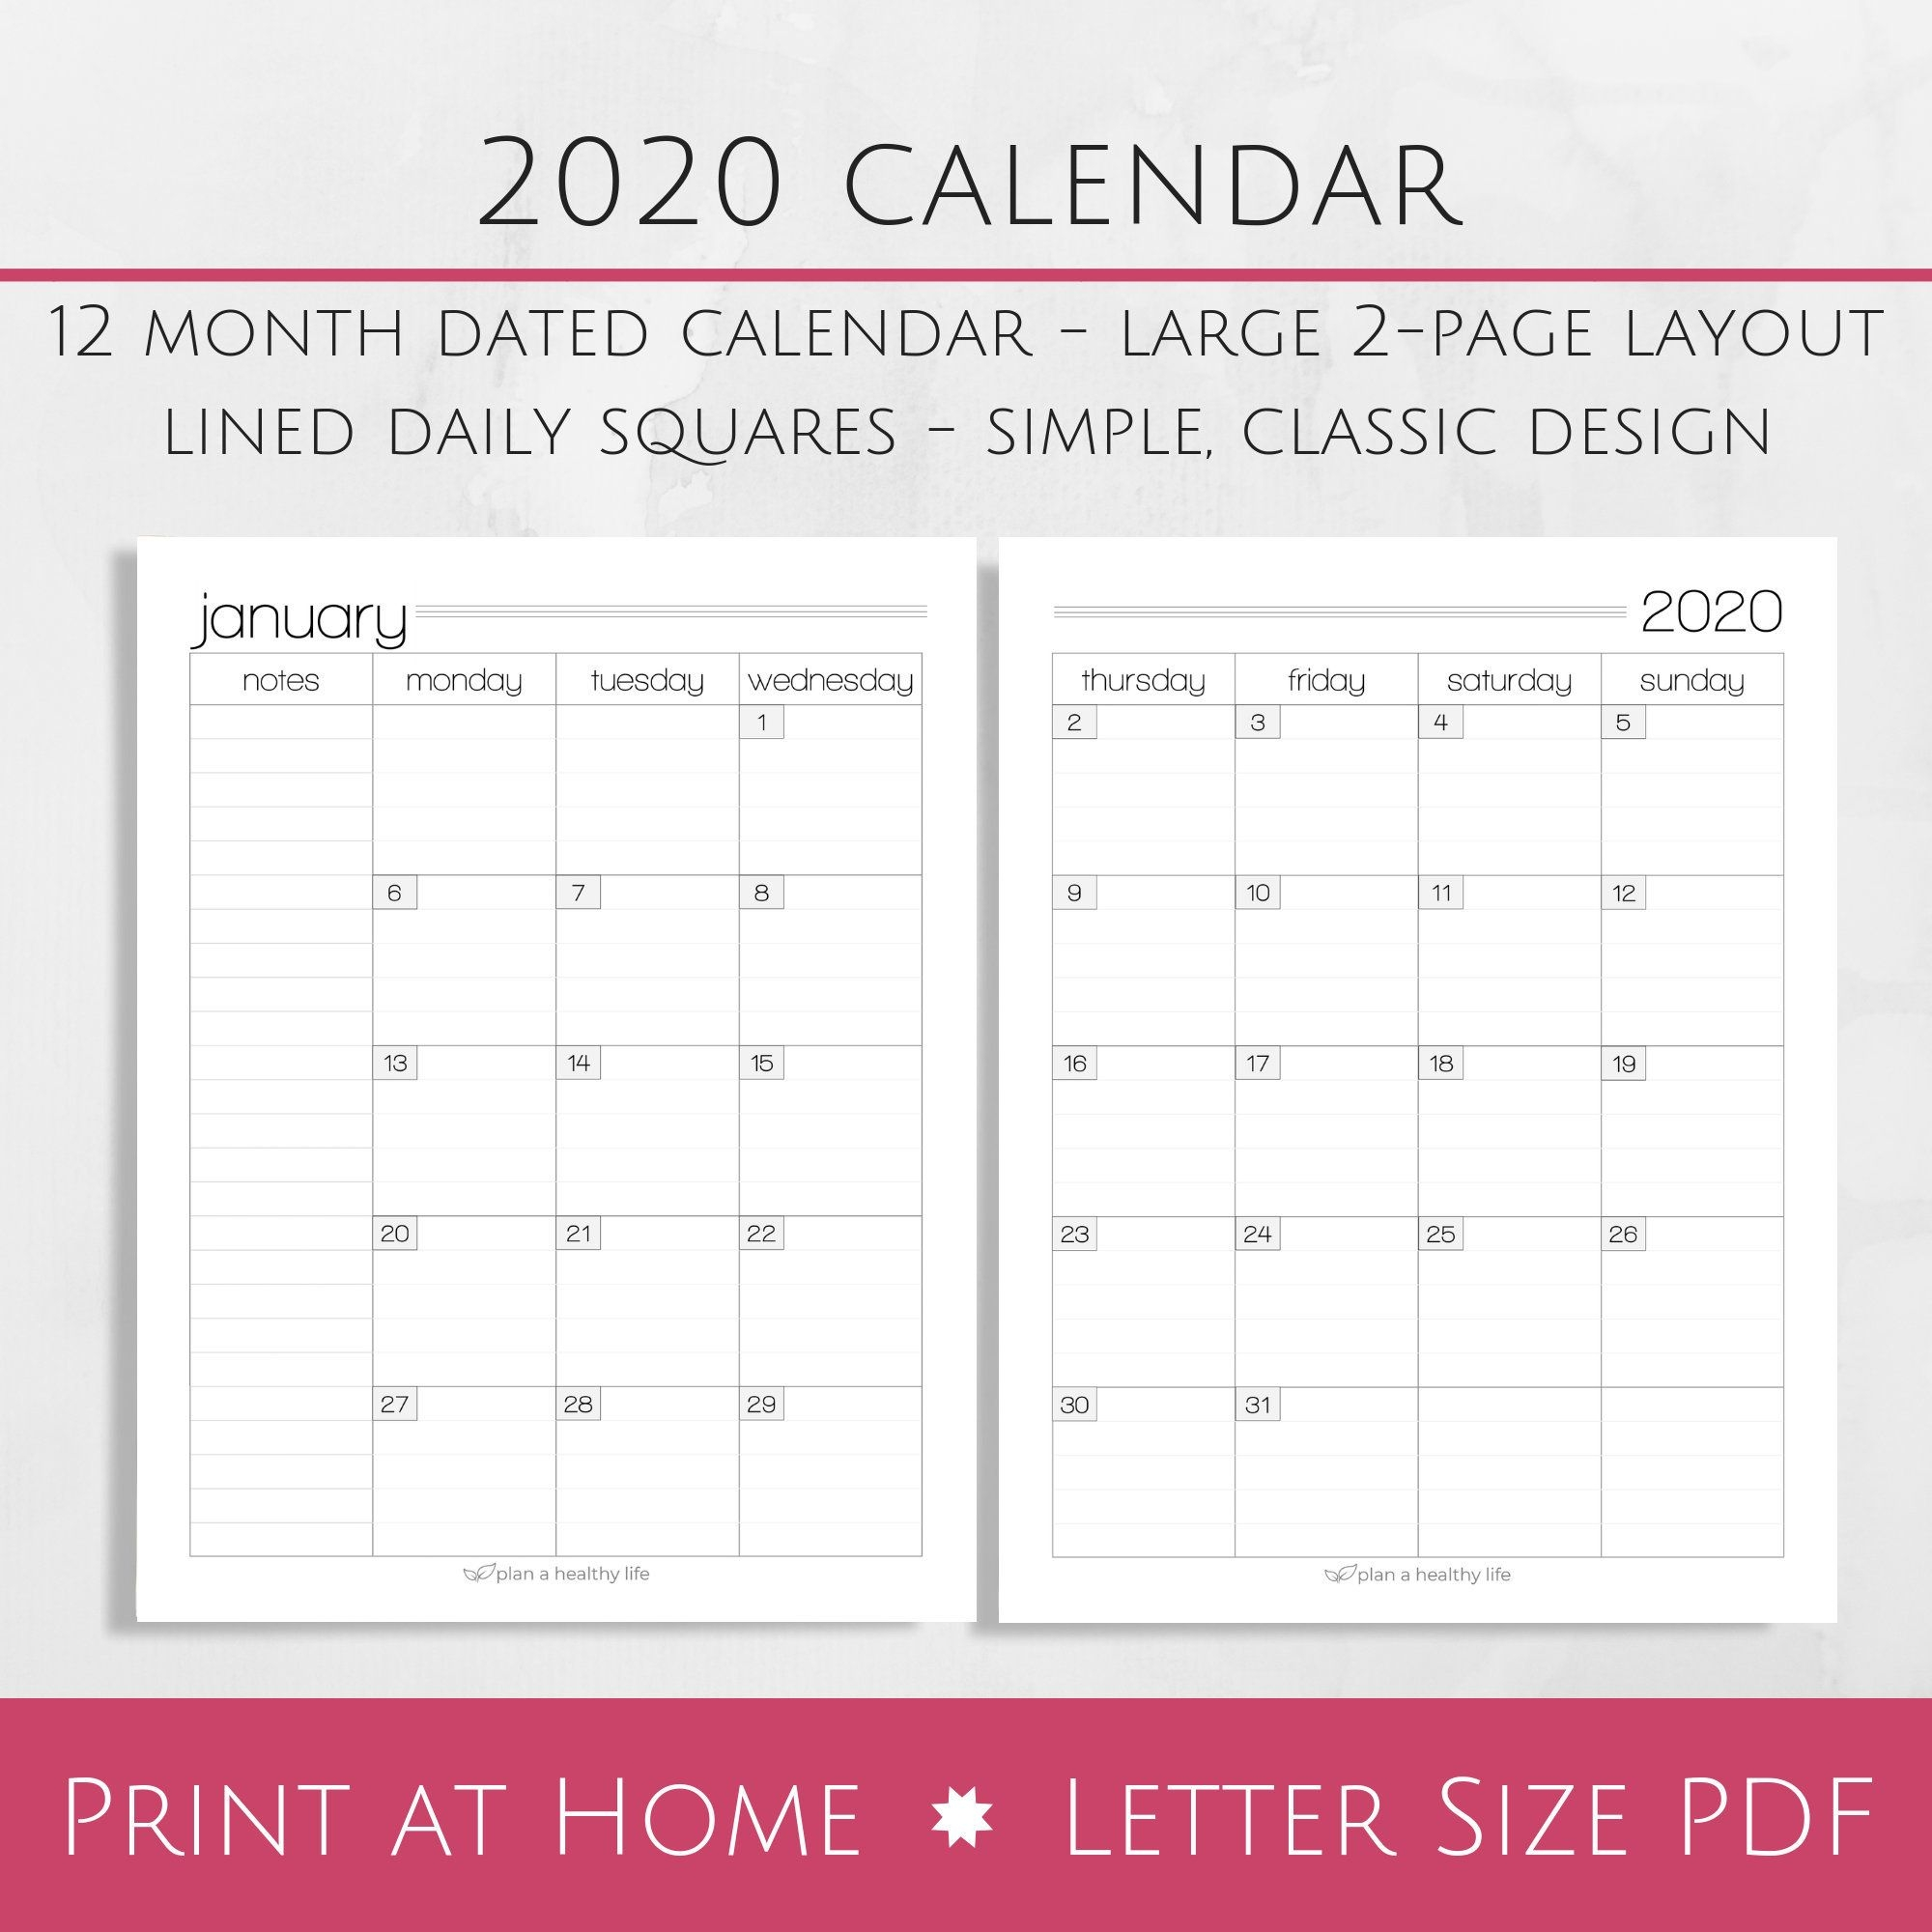 Printable 2020 Monthly Calendar 8 5×11 Letter Size Pdf 2020 Planner Insert Instant Download Planner Calendar